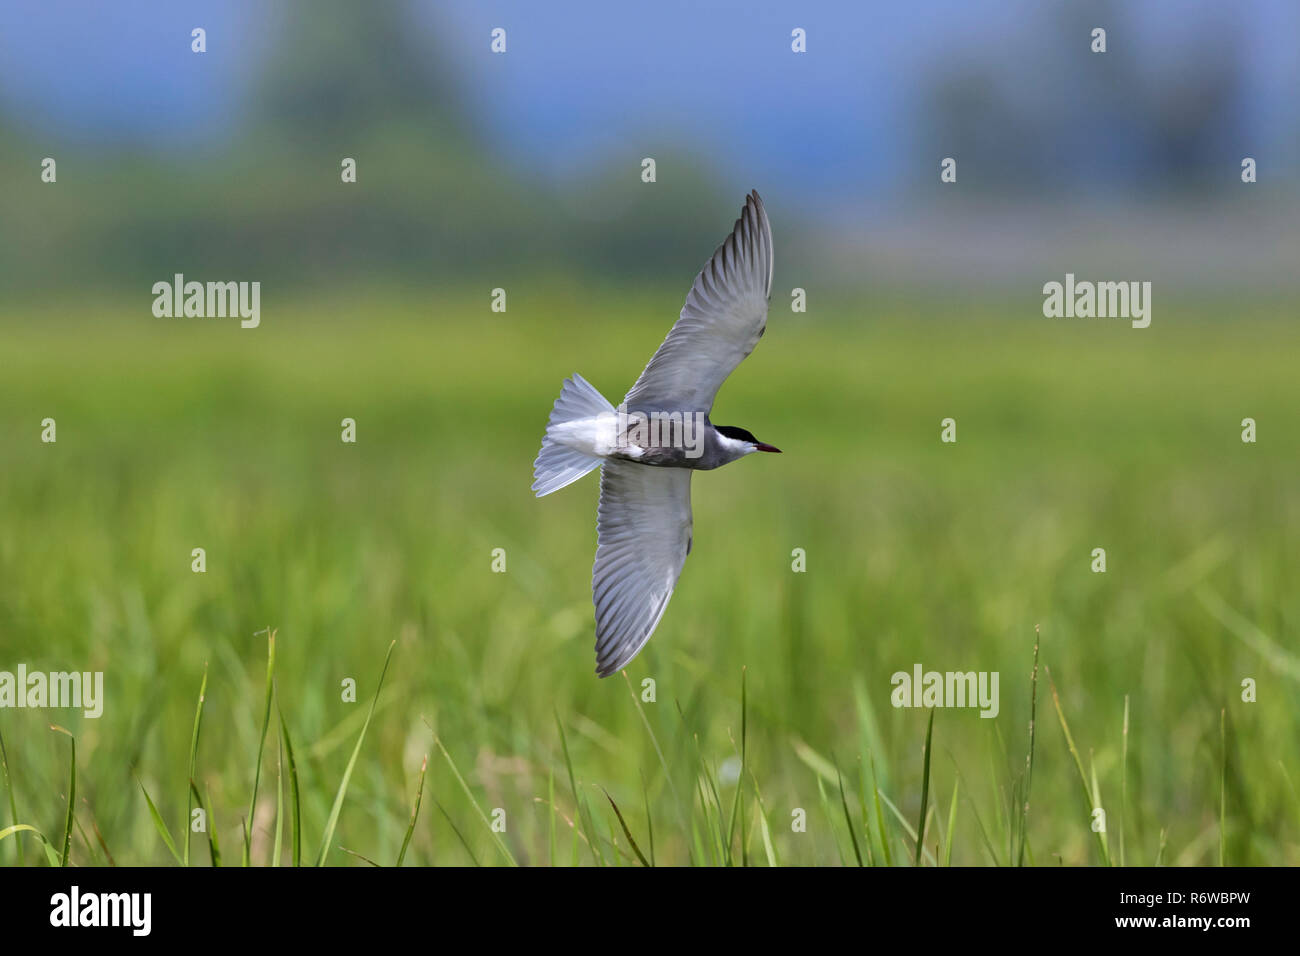 Whiskered tern (Chlidonias hybrida / Chlidonias hybridus) flying over wetland, migratory bird breeding on inland lakes, marshes and rivers in Europe Stock Photo